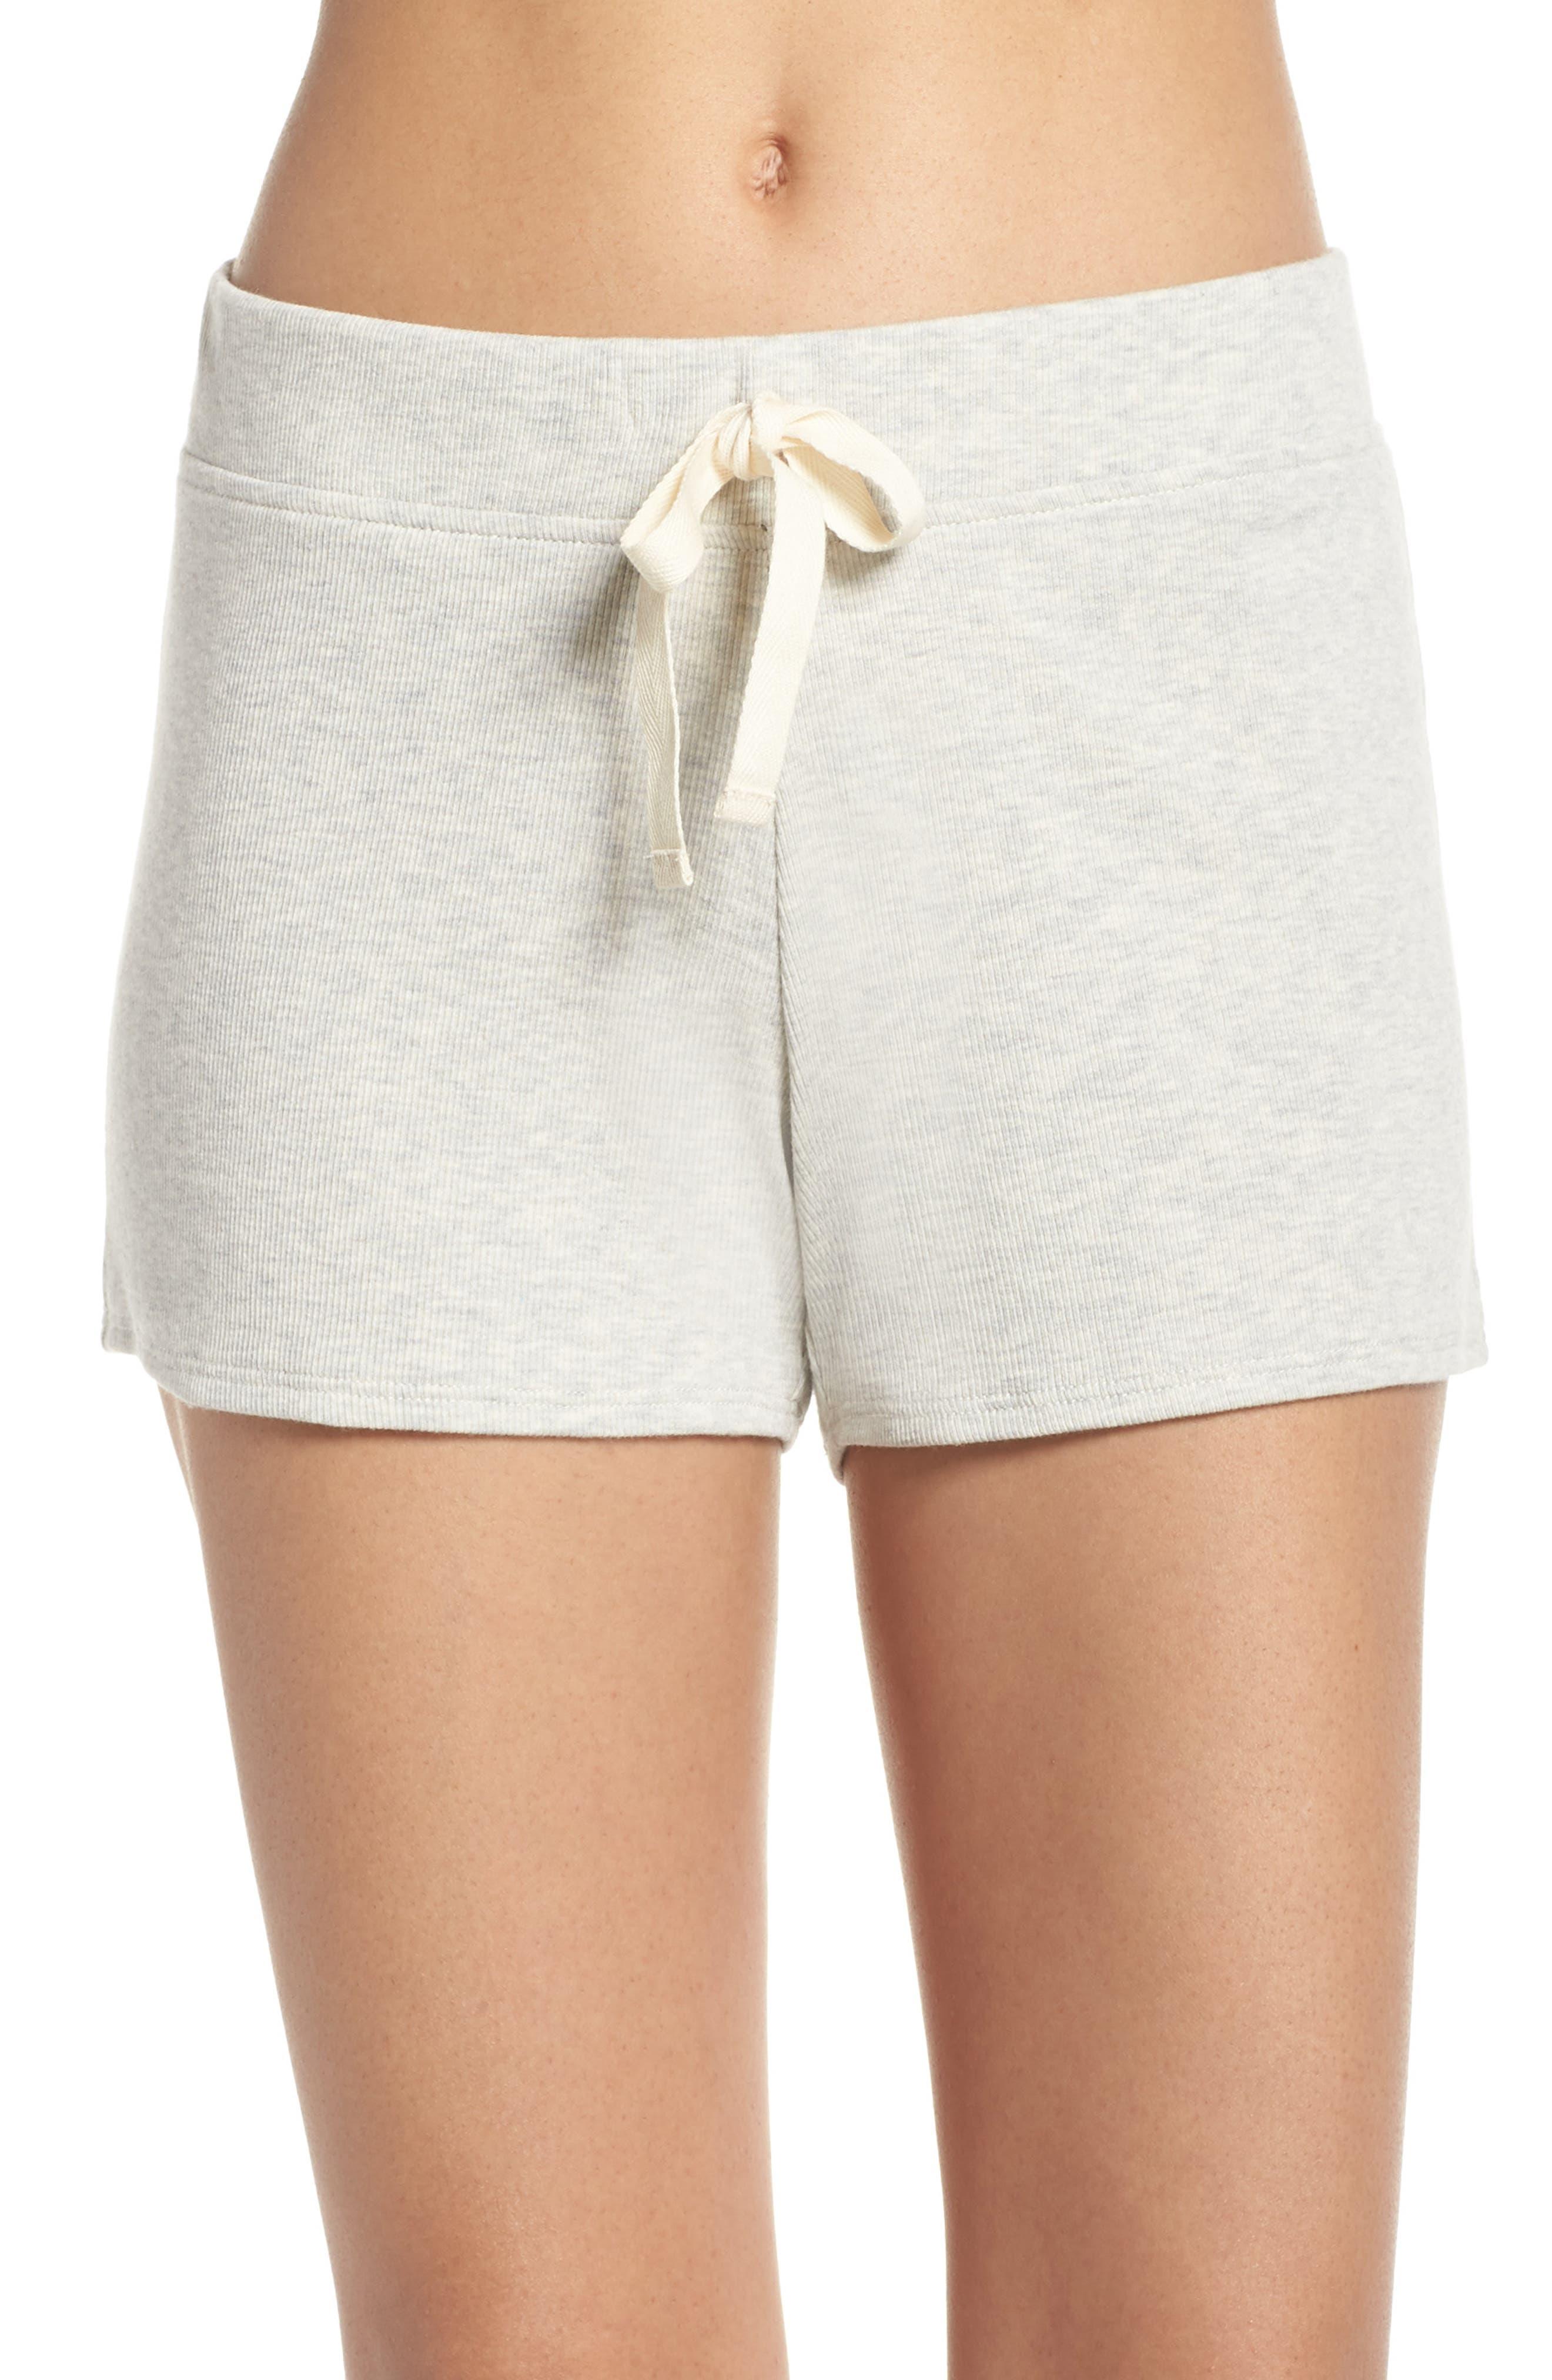 Daydream Lounge Shorts,                             Main thumbnail 1, color,                             061